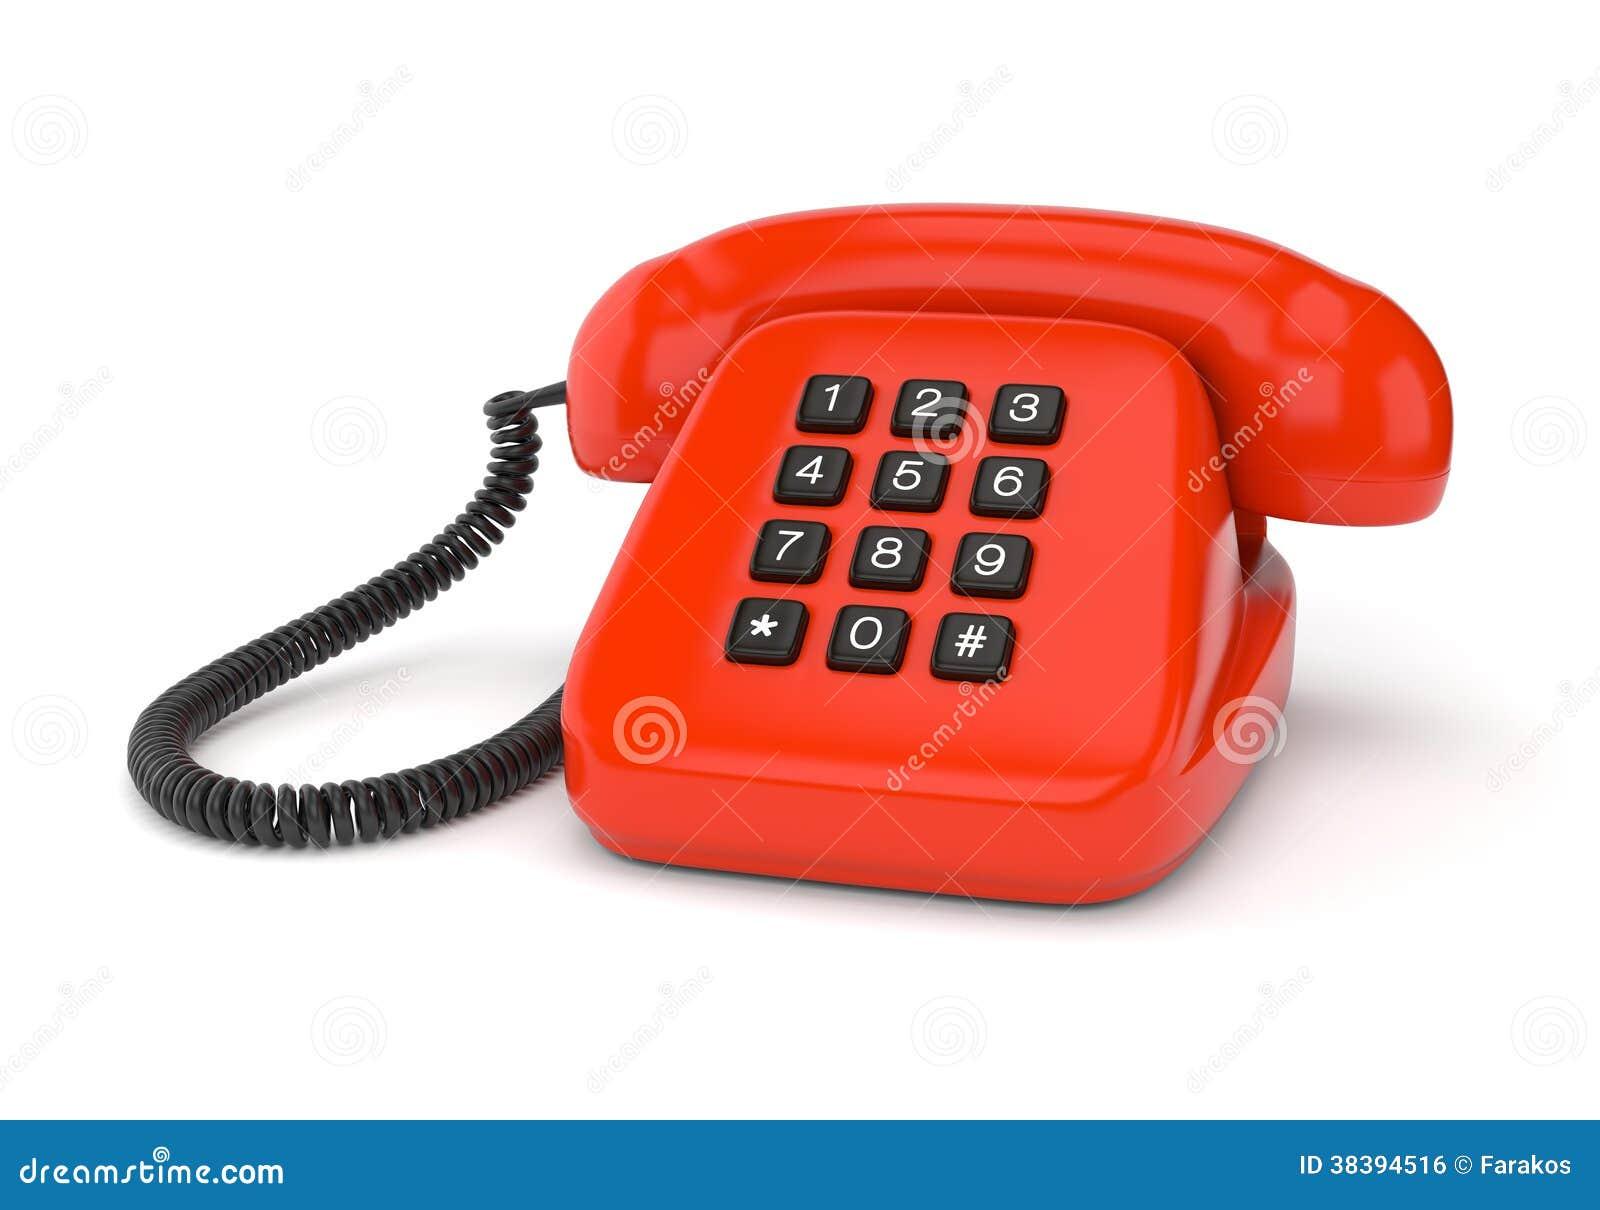 rode retro telefoon royalty vrije stock afbeelding. Black Bedroom Furniture Sets. Home Design Ideas